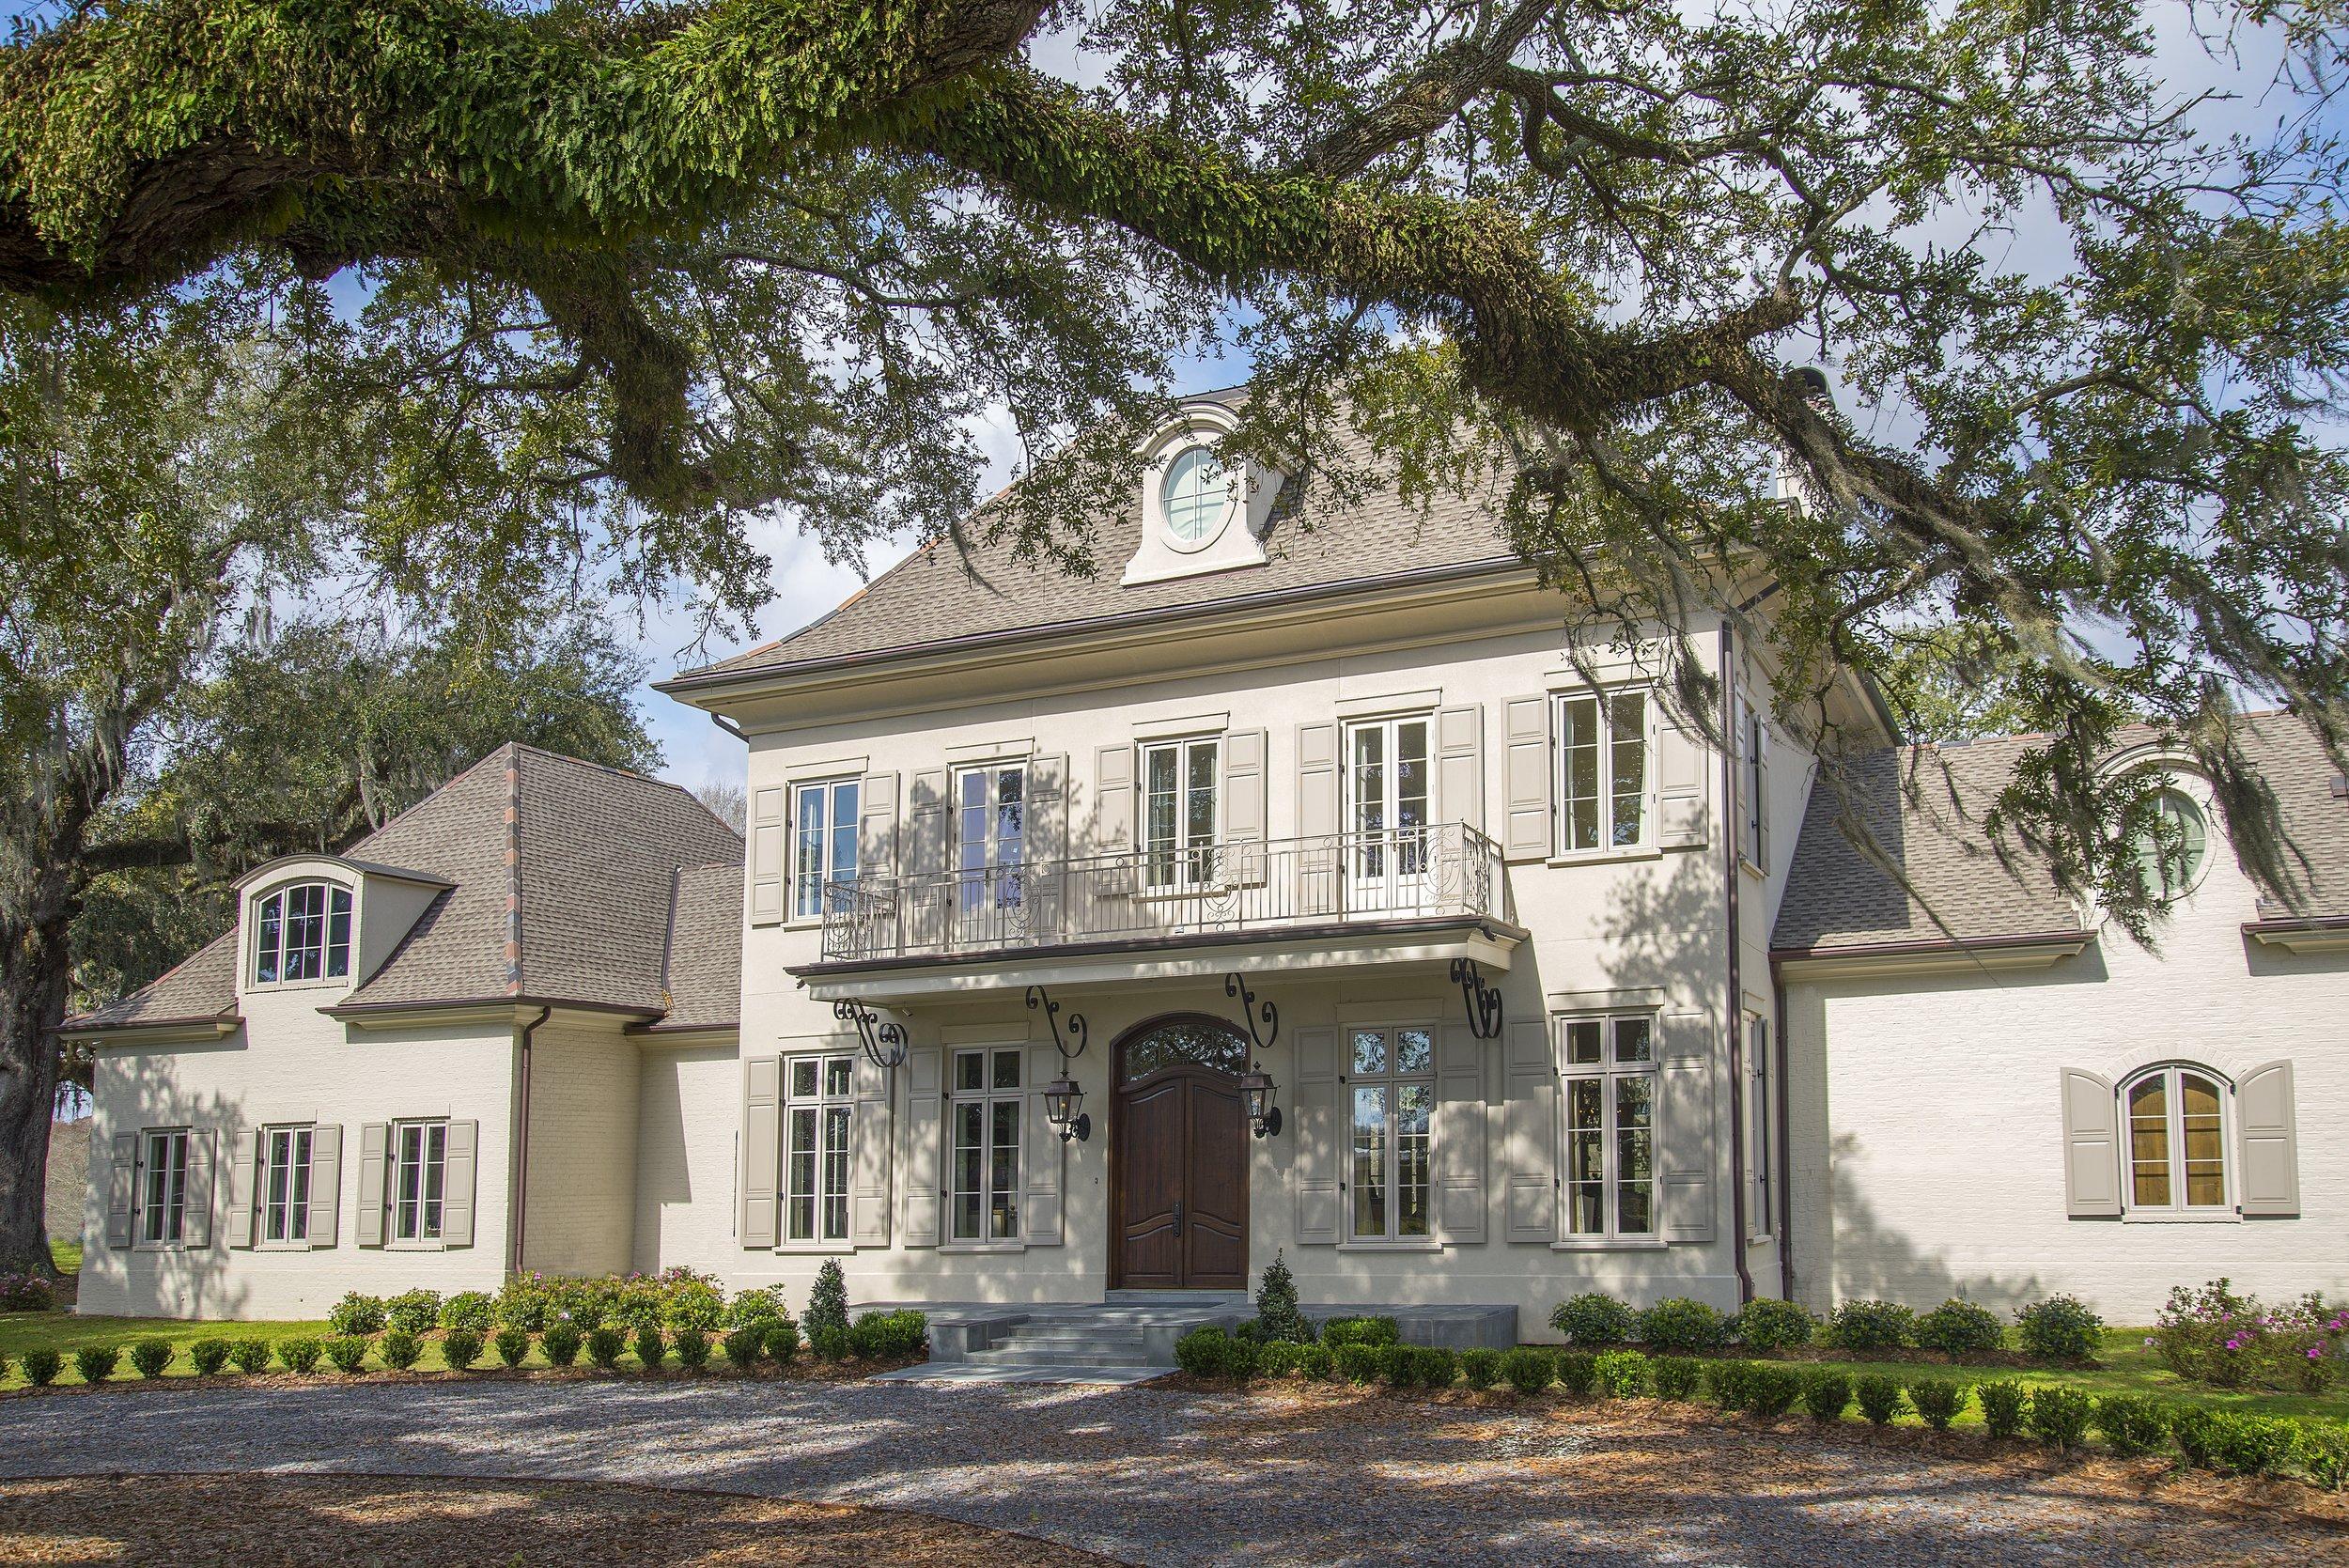 Bayou Teche Residence